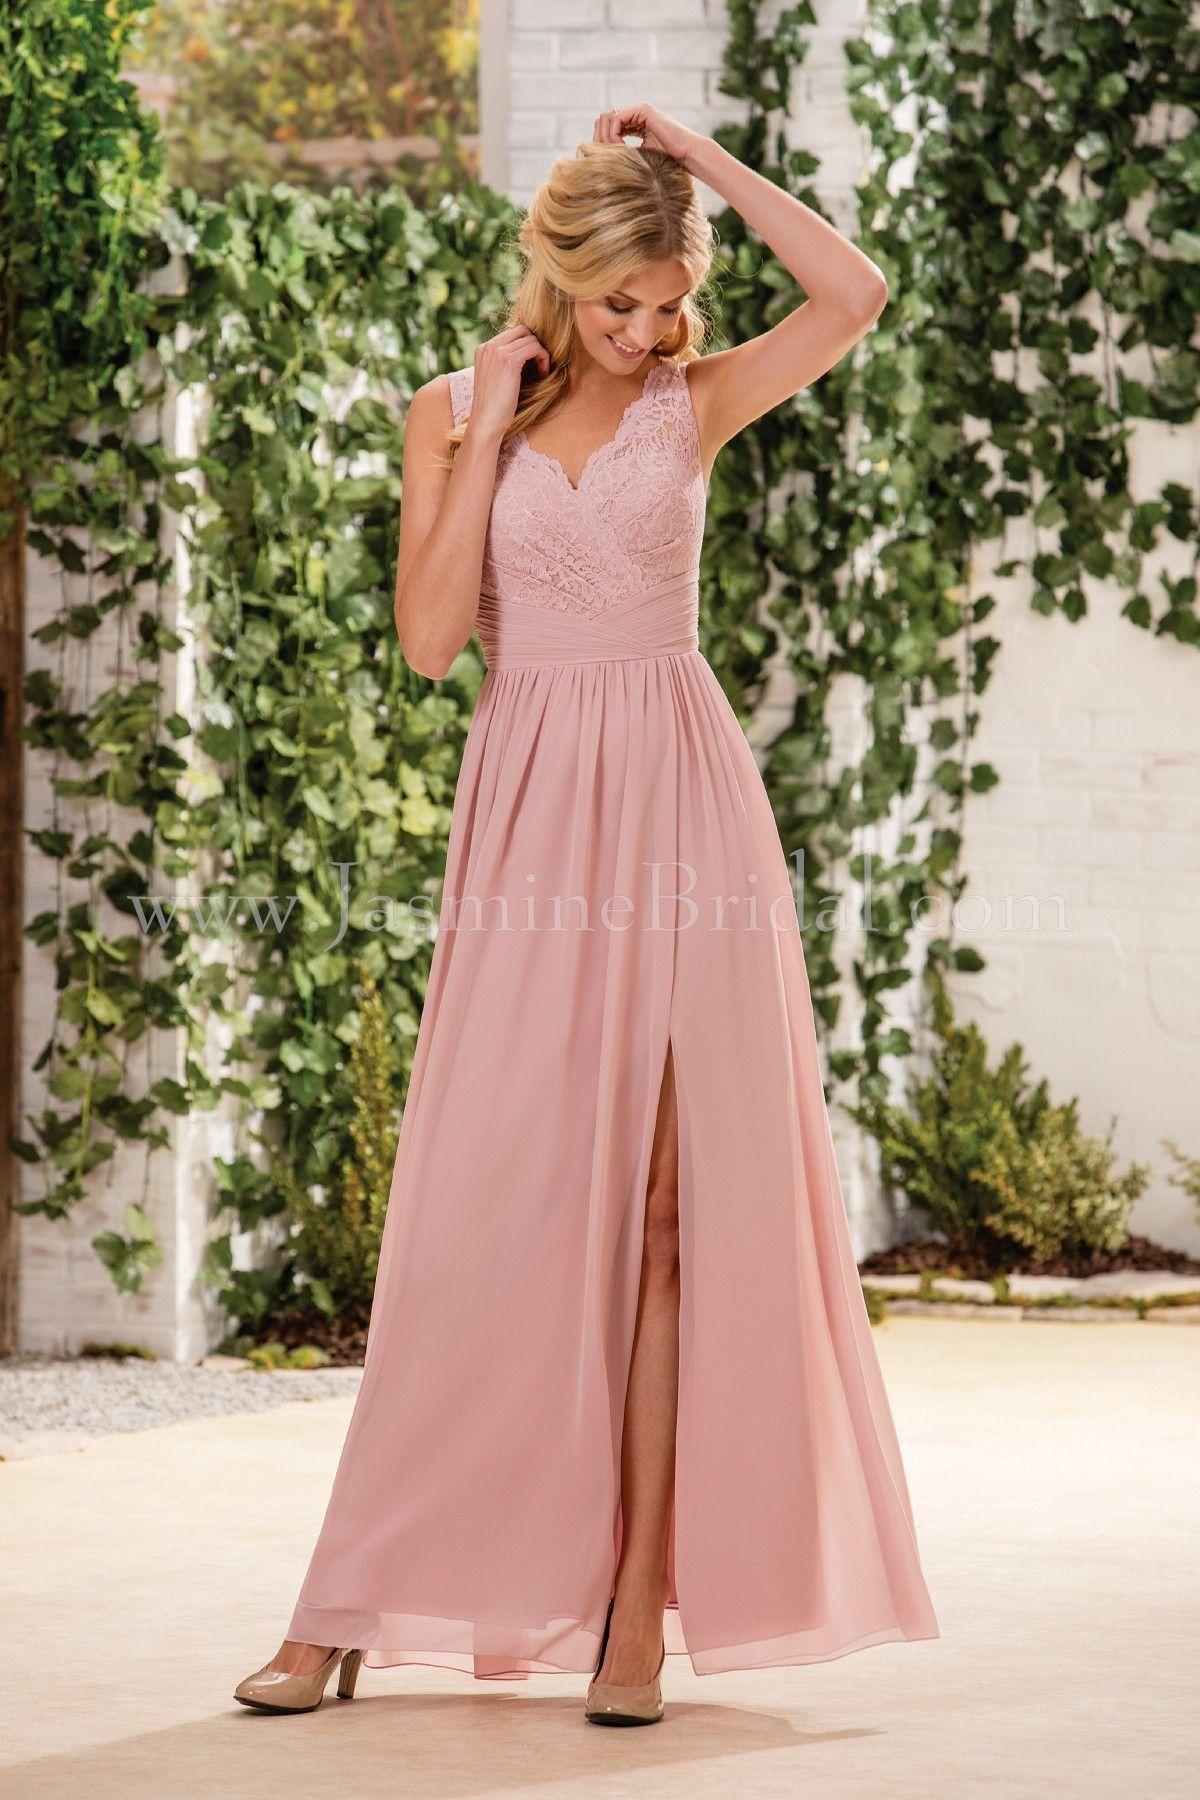 Jasmine Bridal Bridesmaid Dress B2 Style B183060 in Misty Pink ...